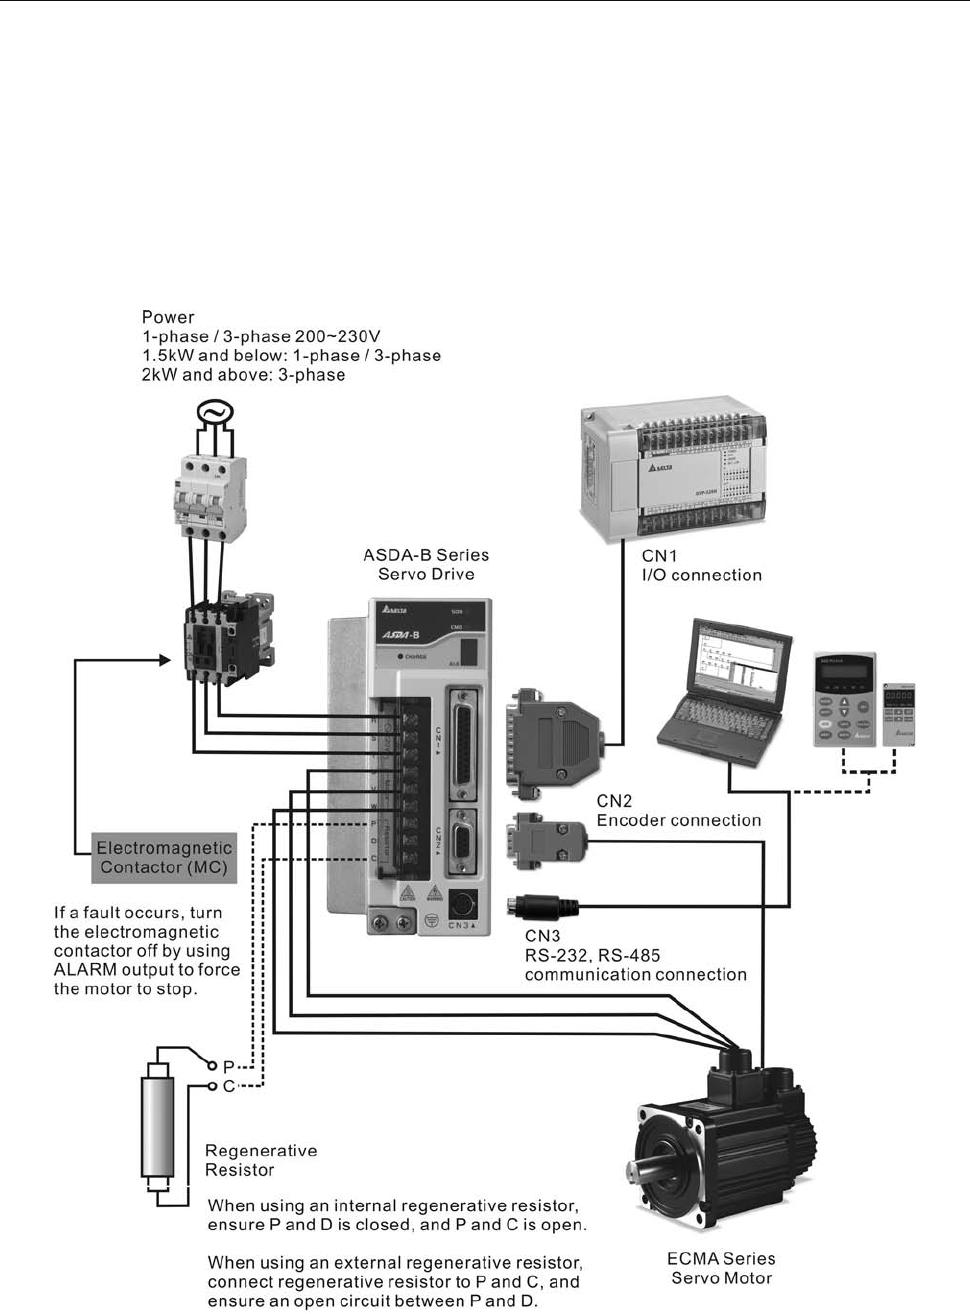 Delta Asda B Series Users Manual USER MANUAL(DELTA)CURVE